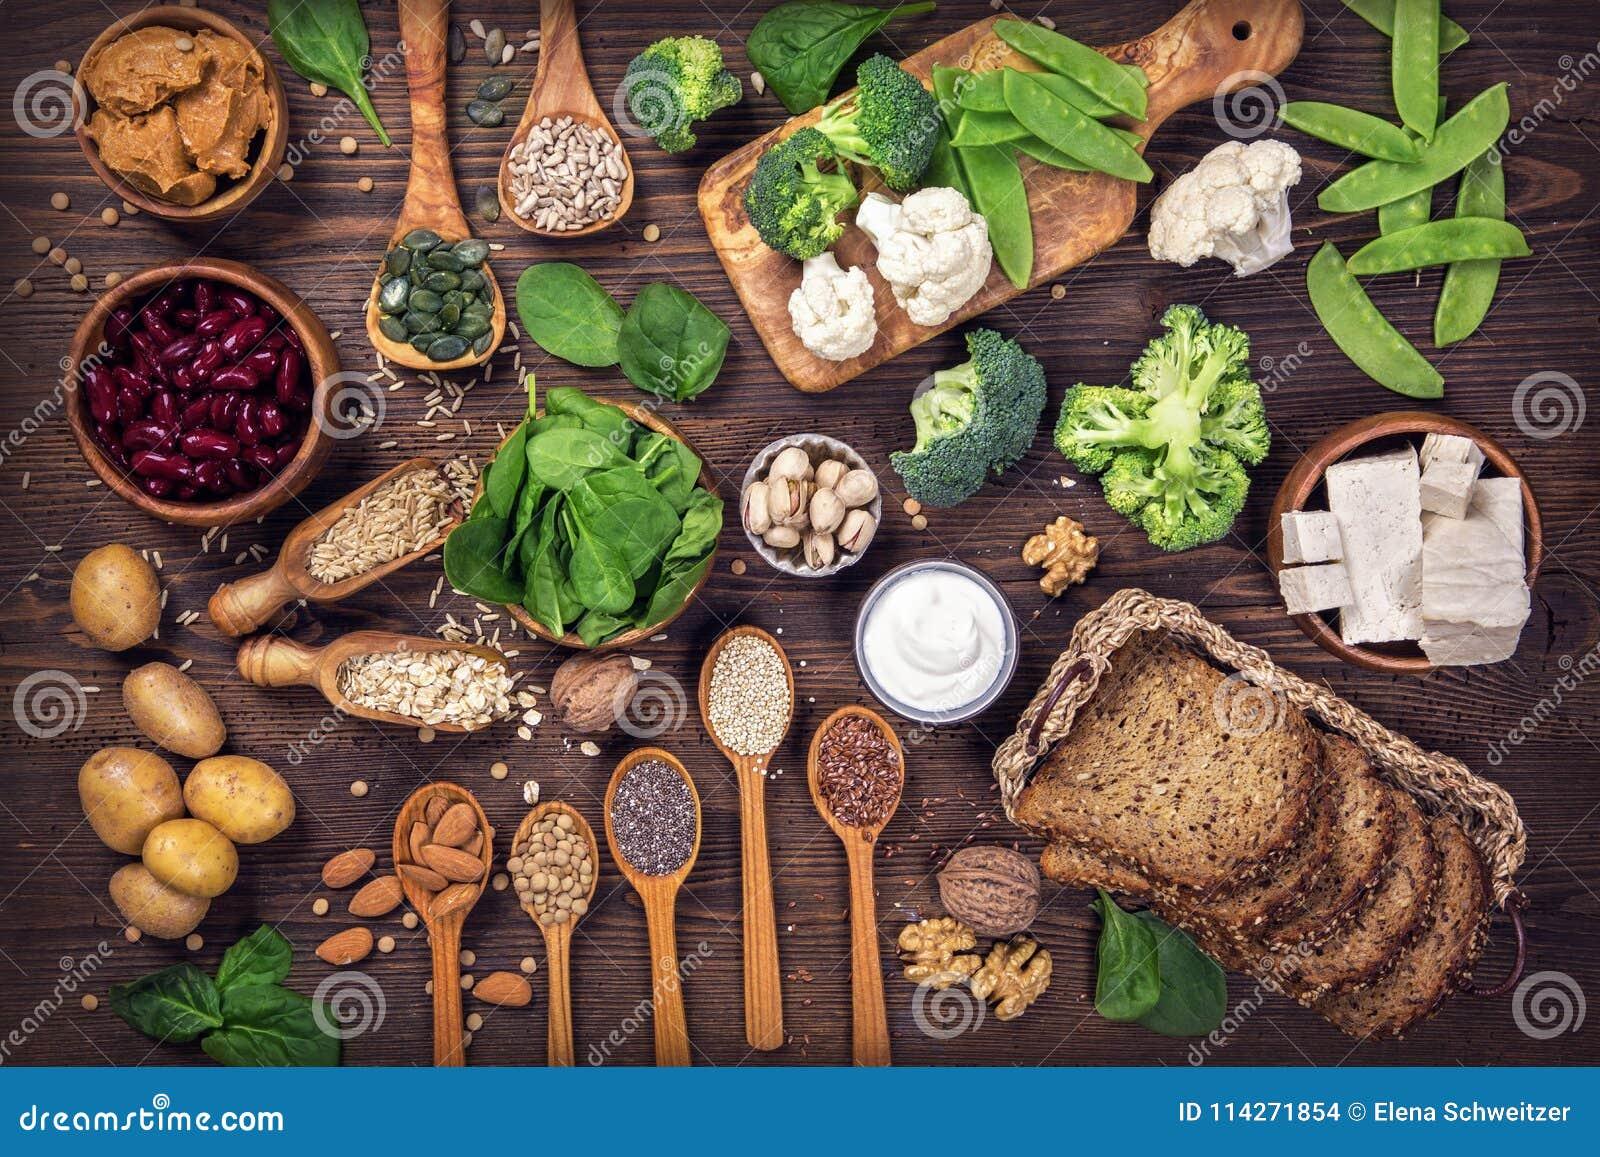 Vegan protein sources.